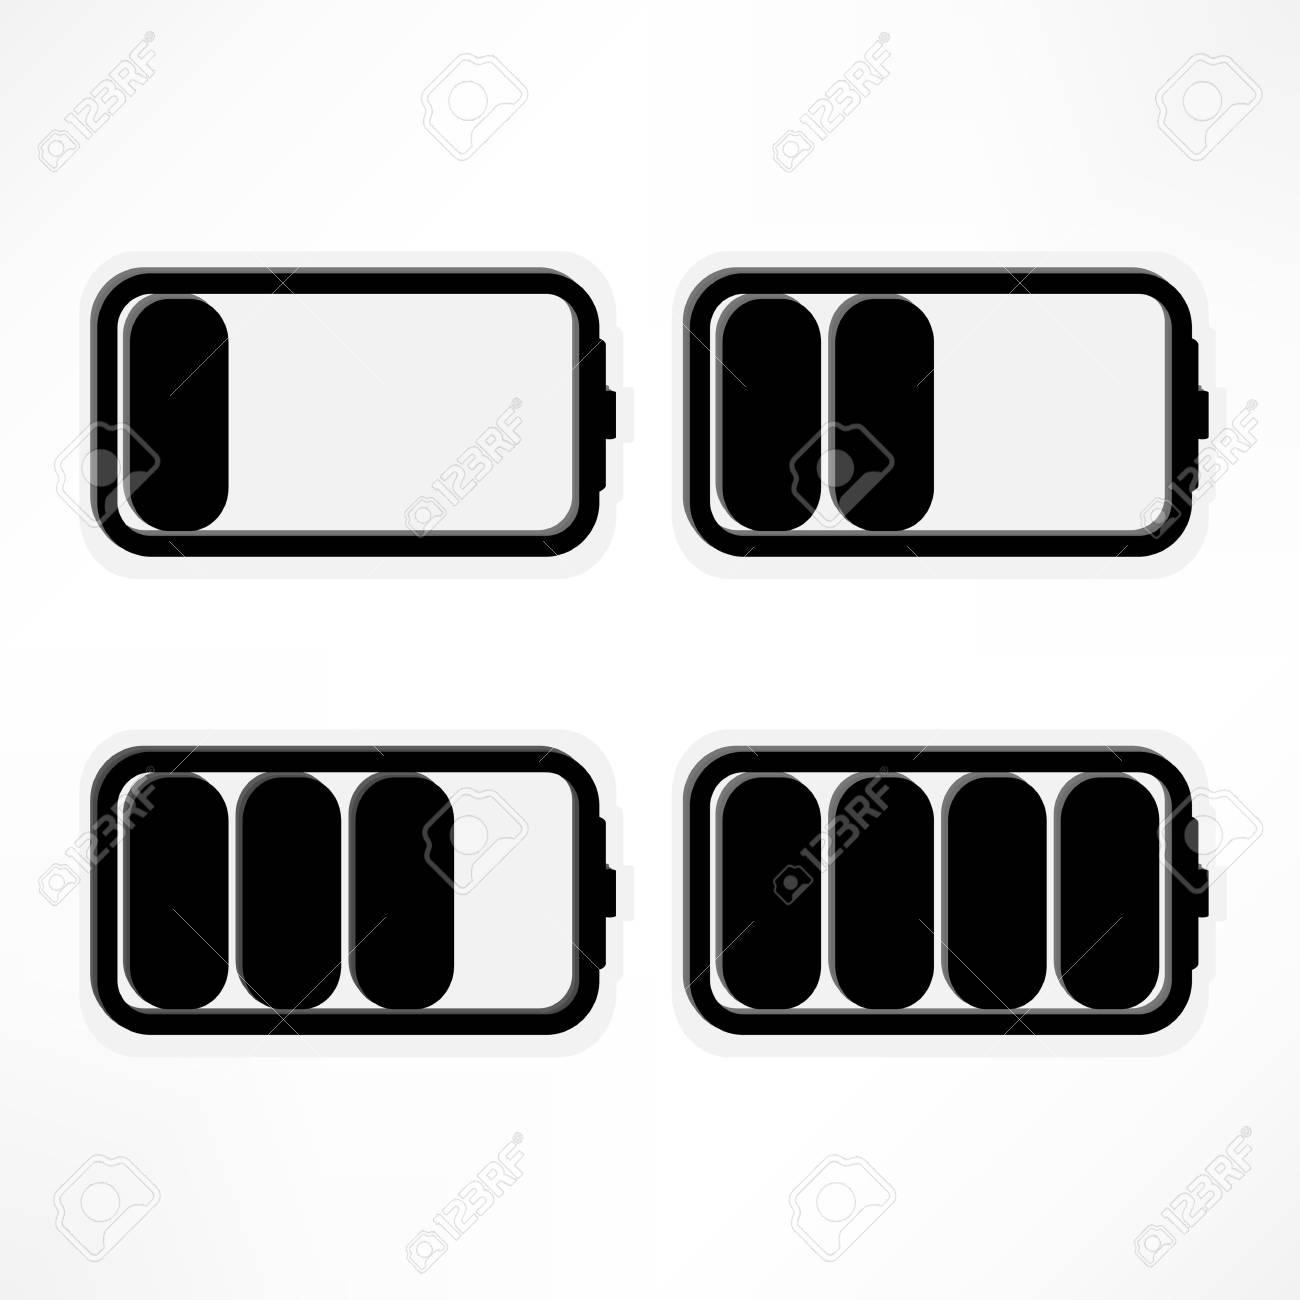 Set of battery charge level indicators  Vector illustration Stock Photo - 16538783